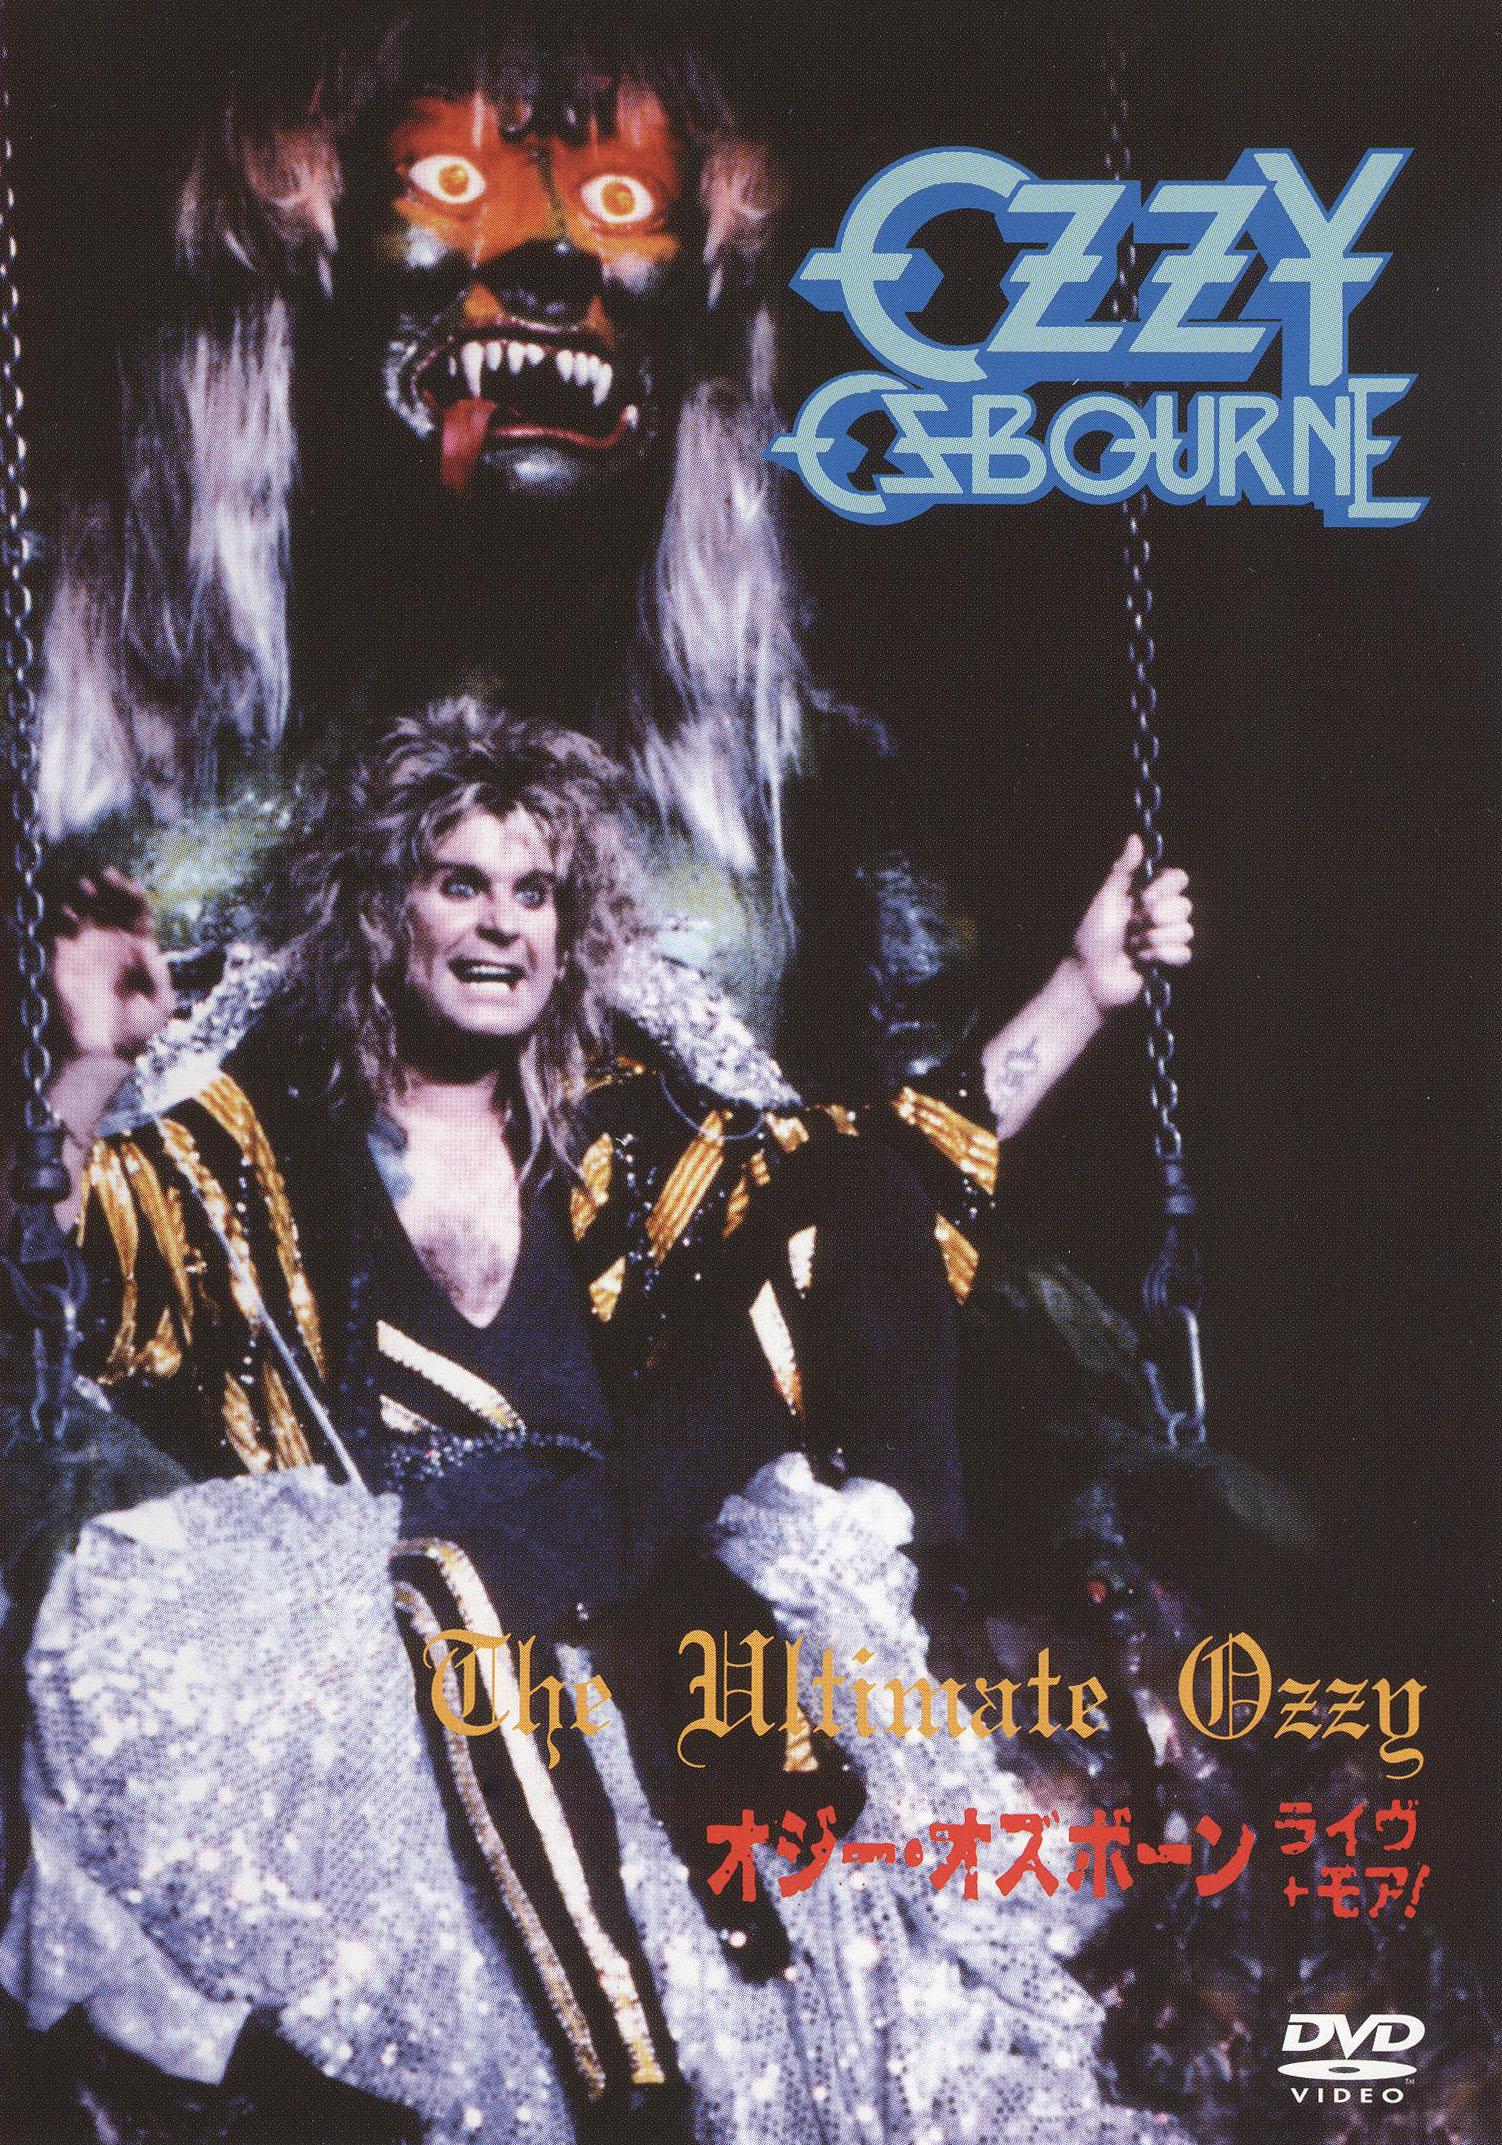 Ozzy Osbourne: The Ultimate Ozzy